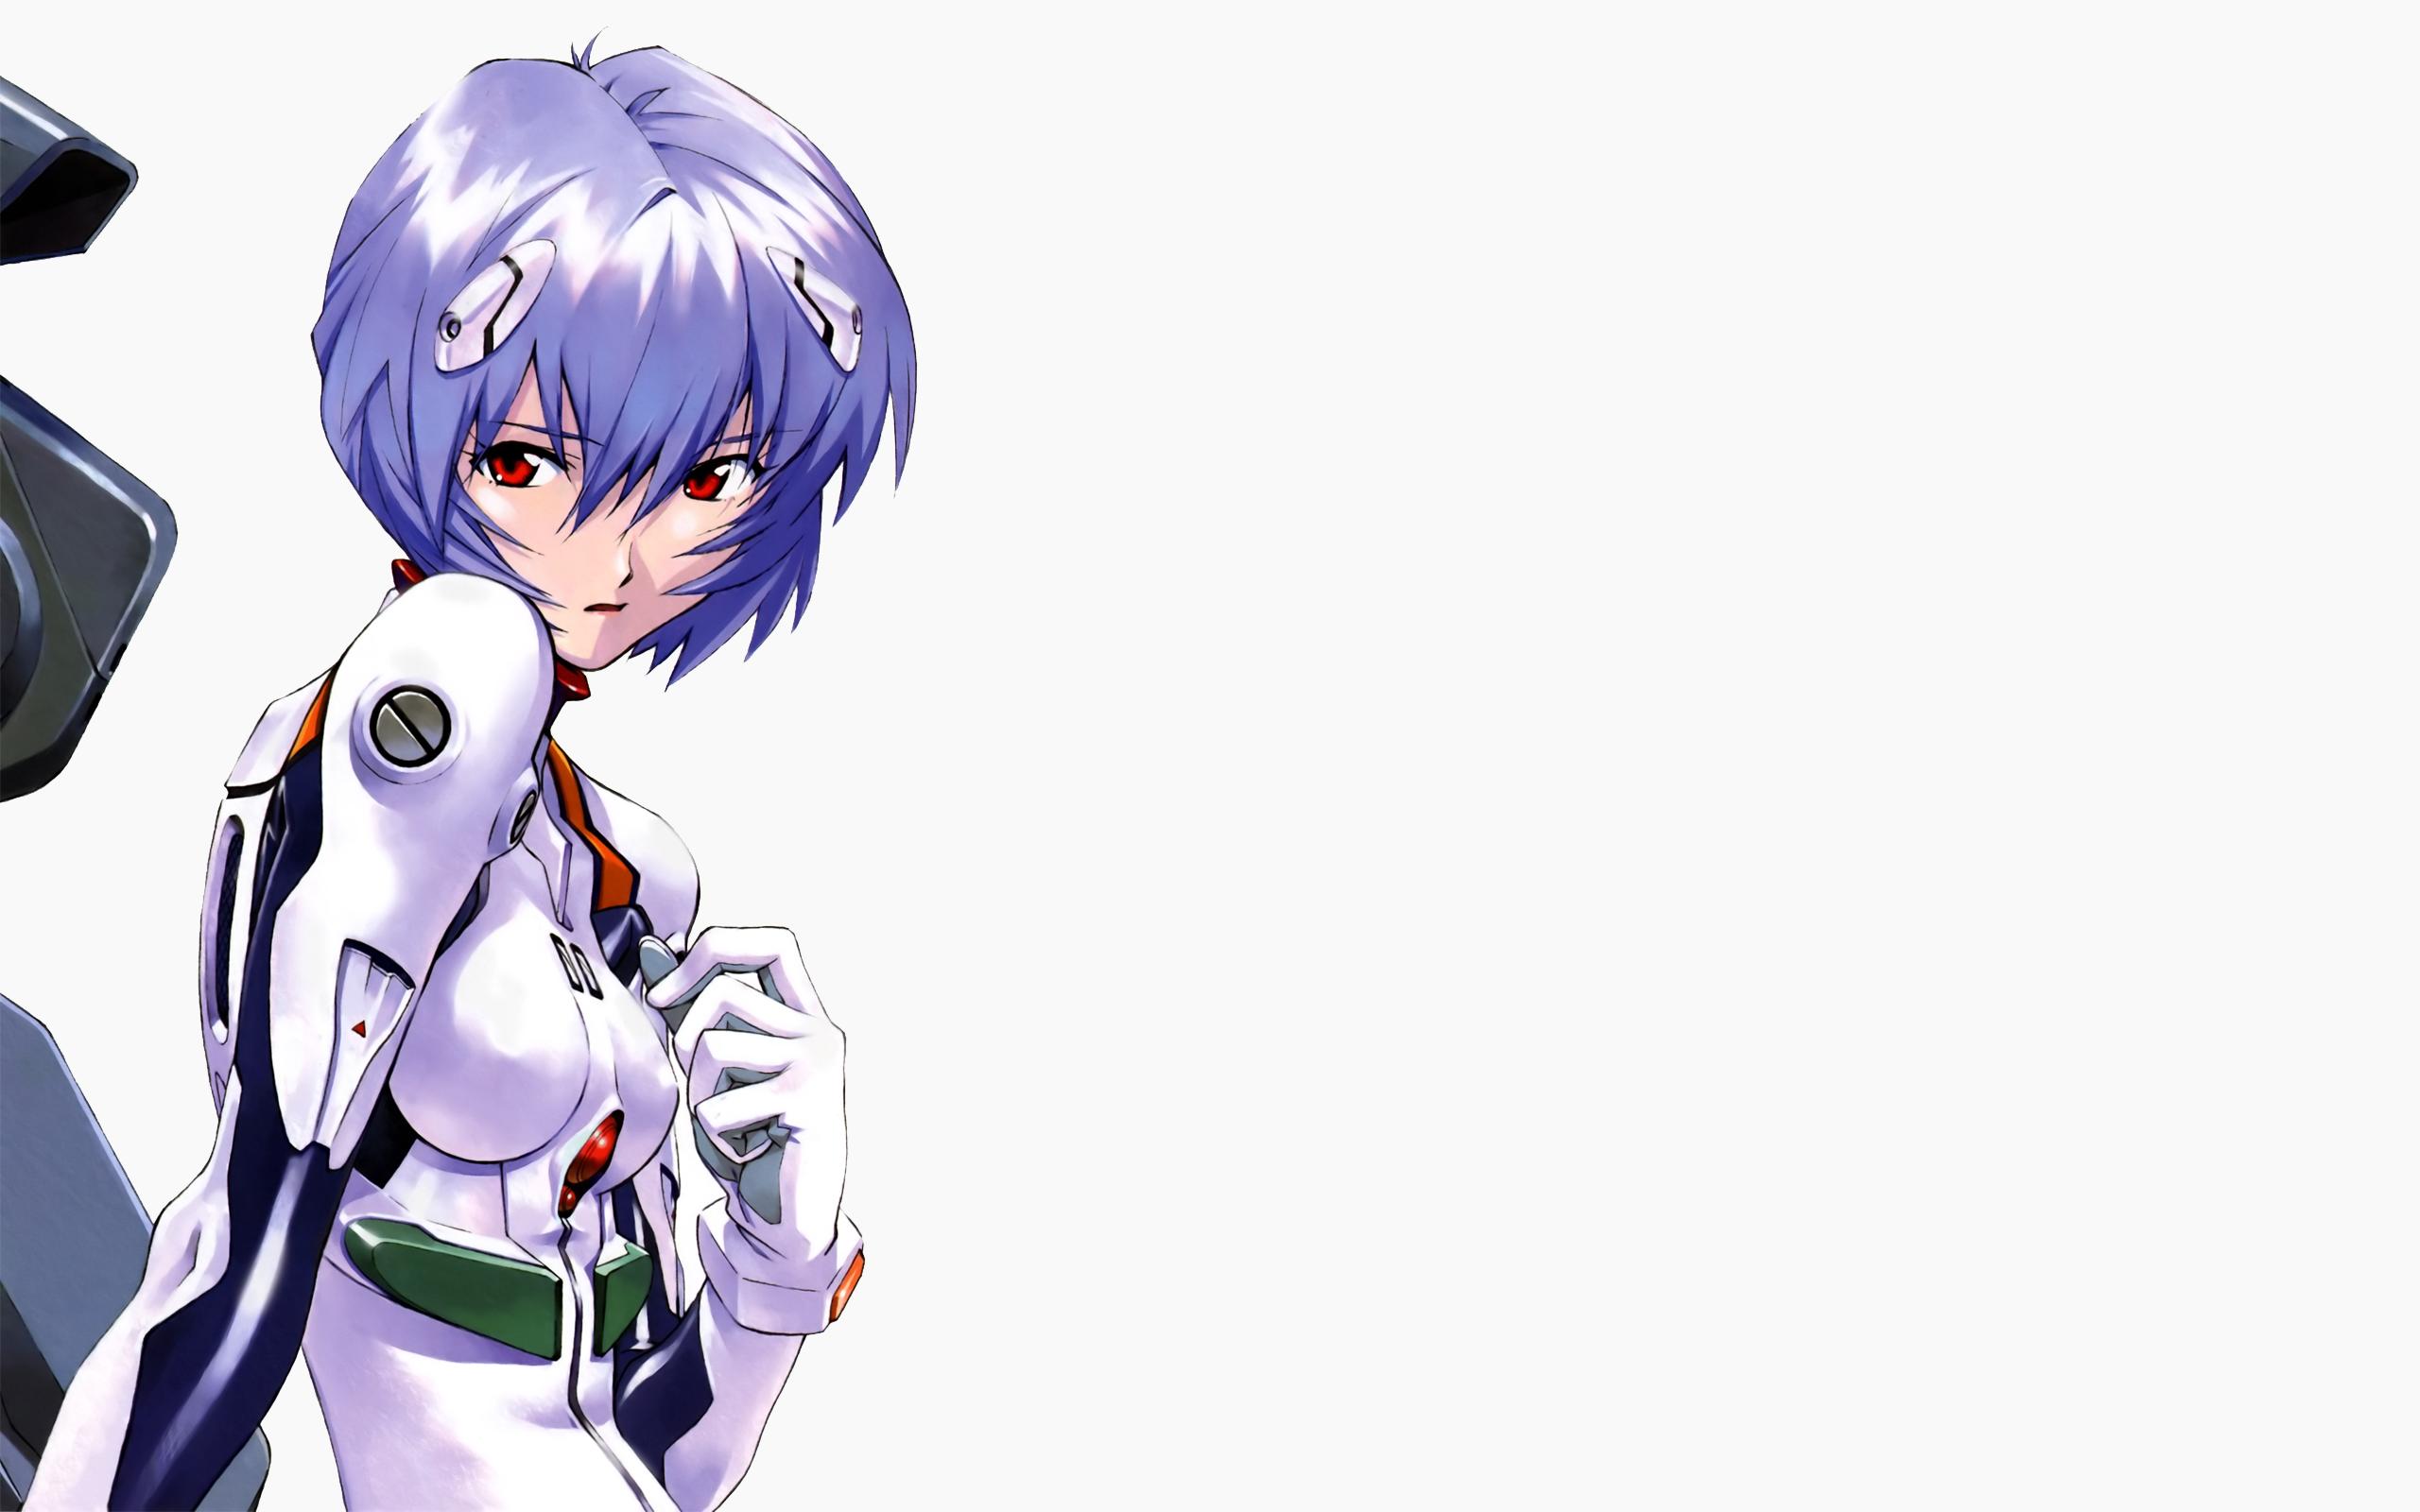 evangelion wallpaper hd anime - photo #49